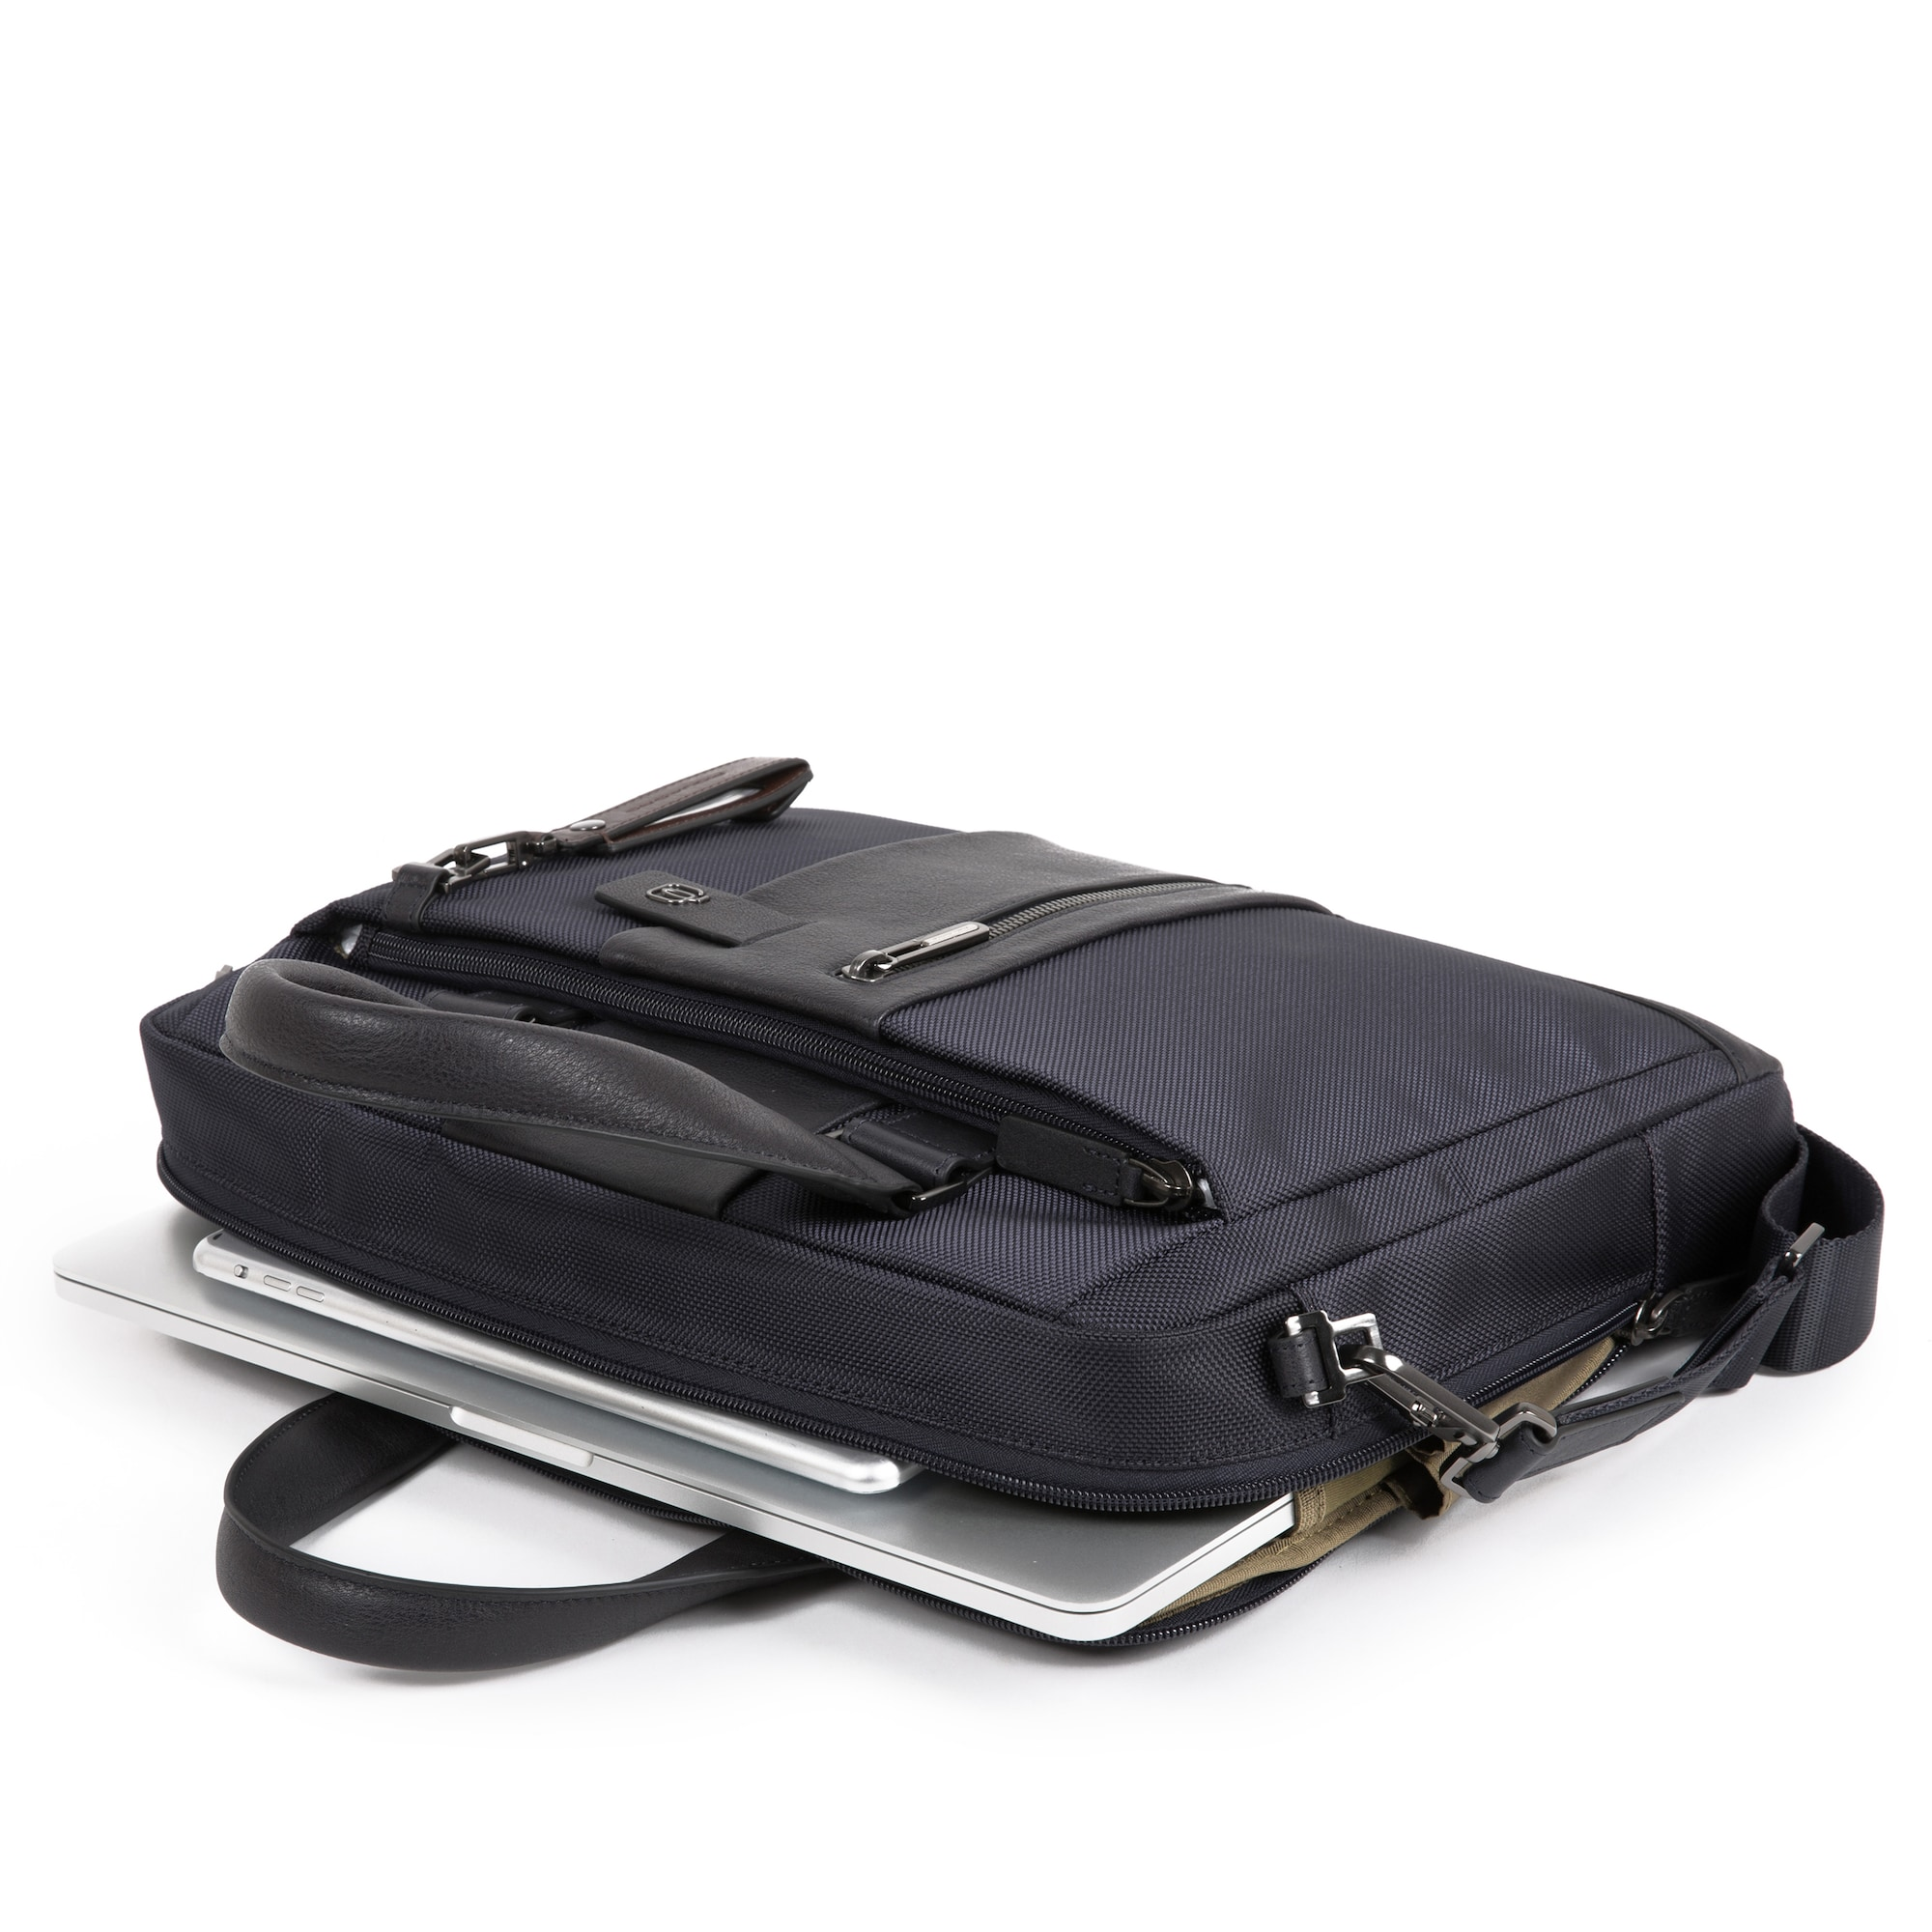 piquadro - Laptoptasche Leder 37 cm Laptopfach